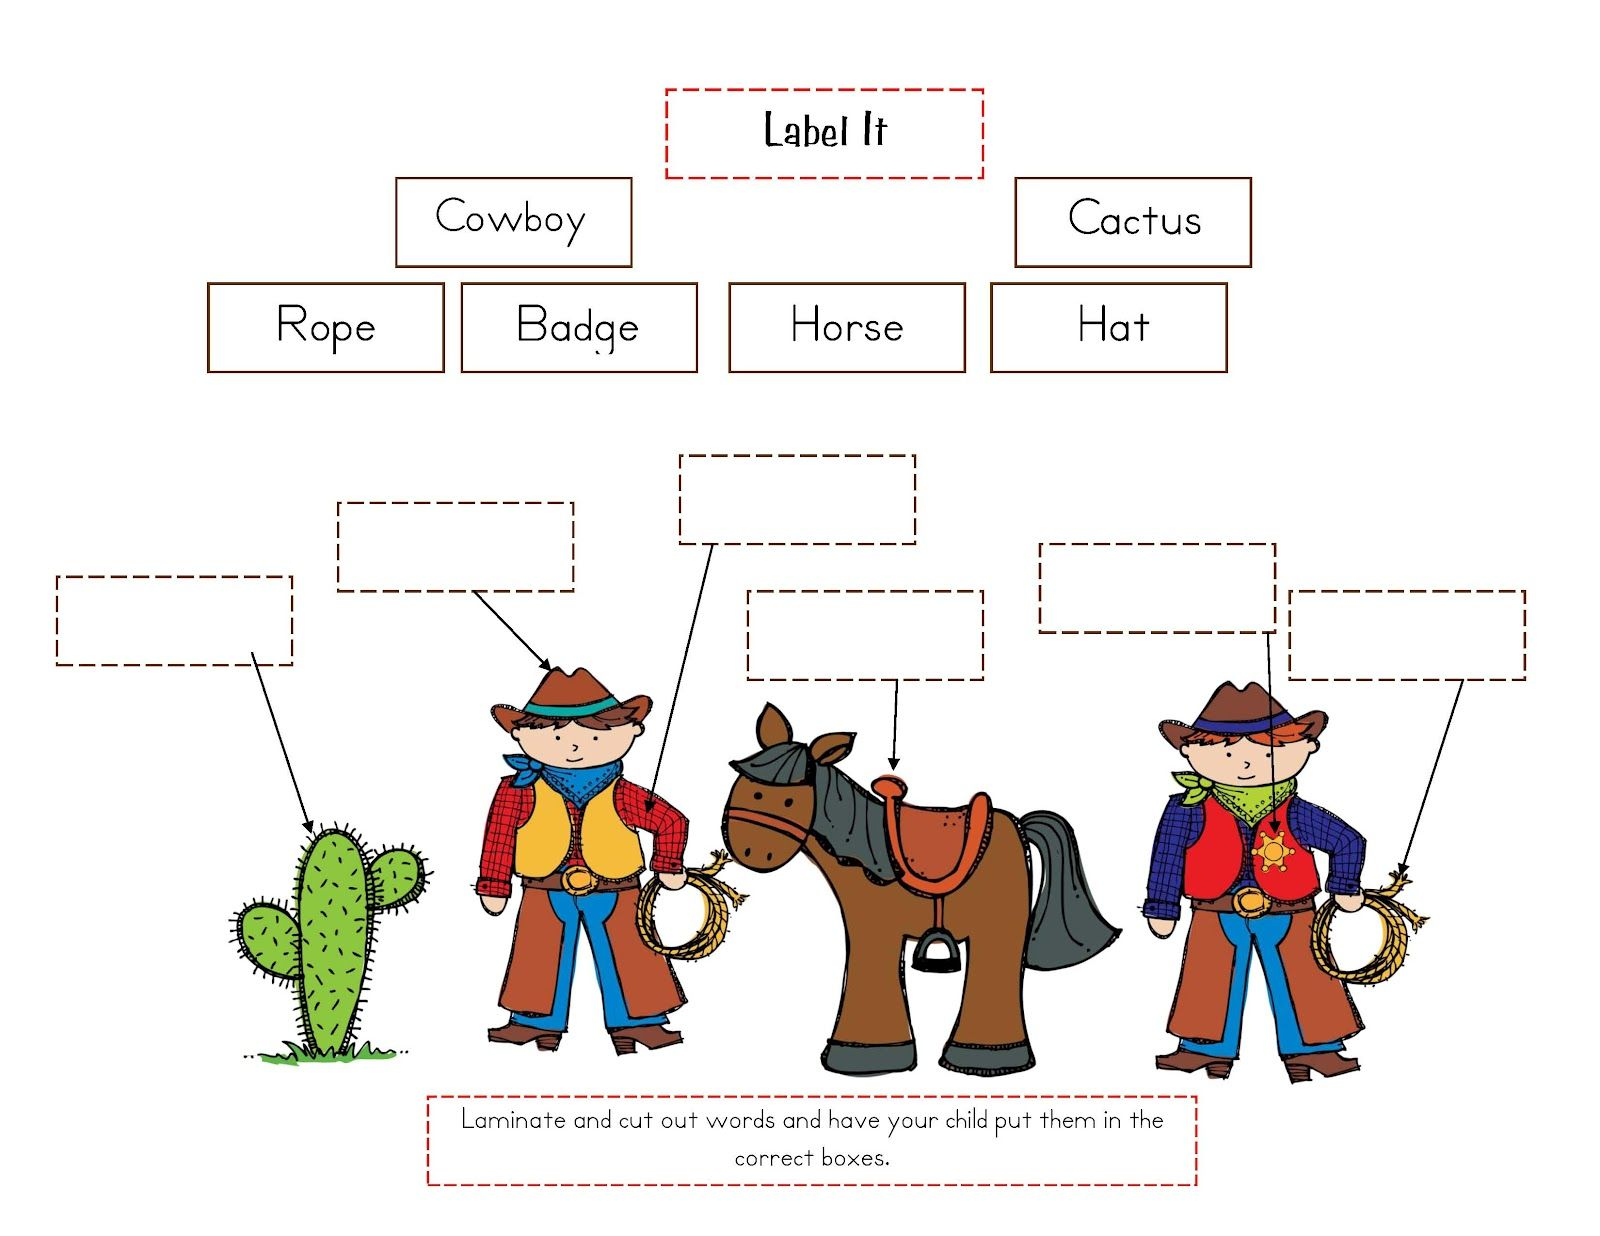 preschool printables cowboy themes misc pinterest preschool printables cowboys and. Black Bedroom Furniture Sets. Home Design Ideas